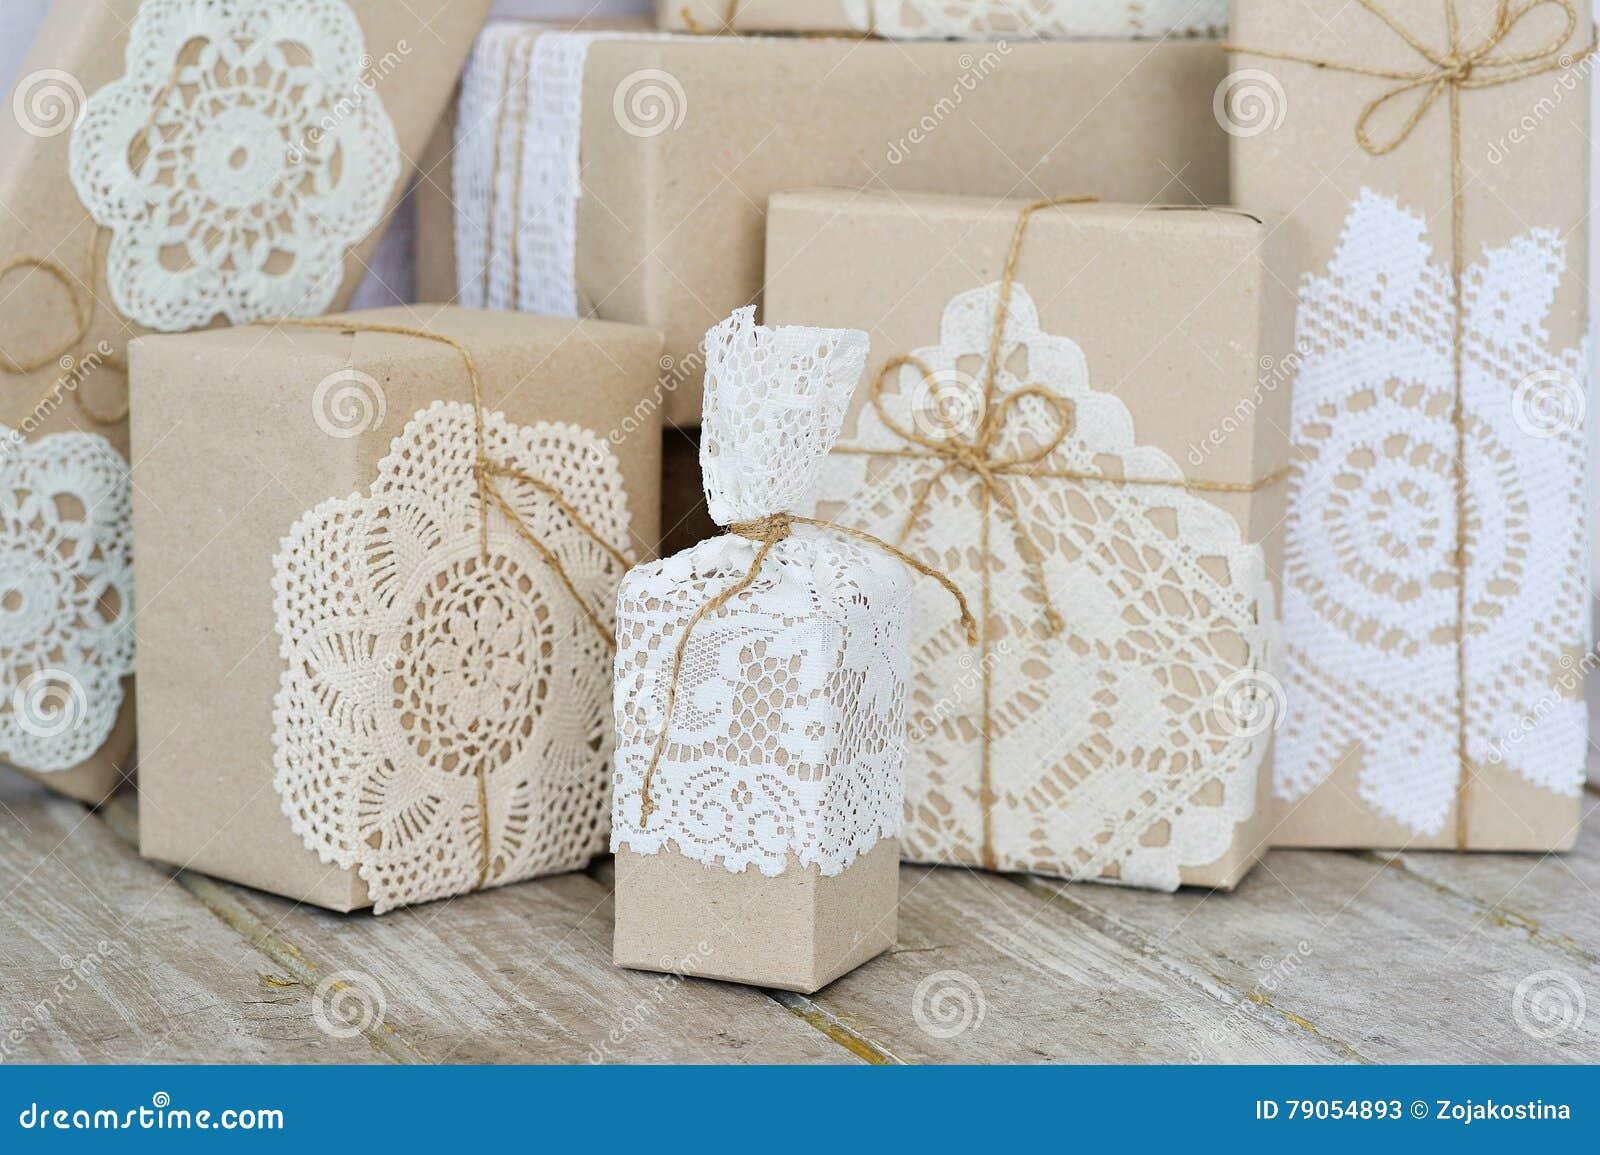 Christmas Box Wrapping Ideas Stock Image Image Of Handmade